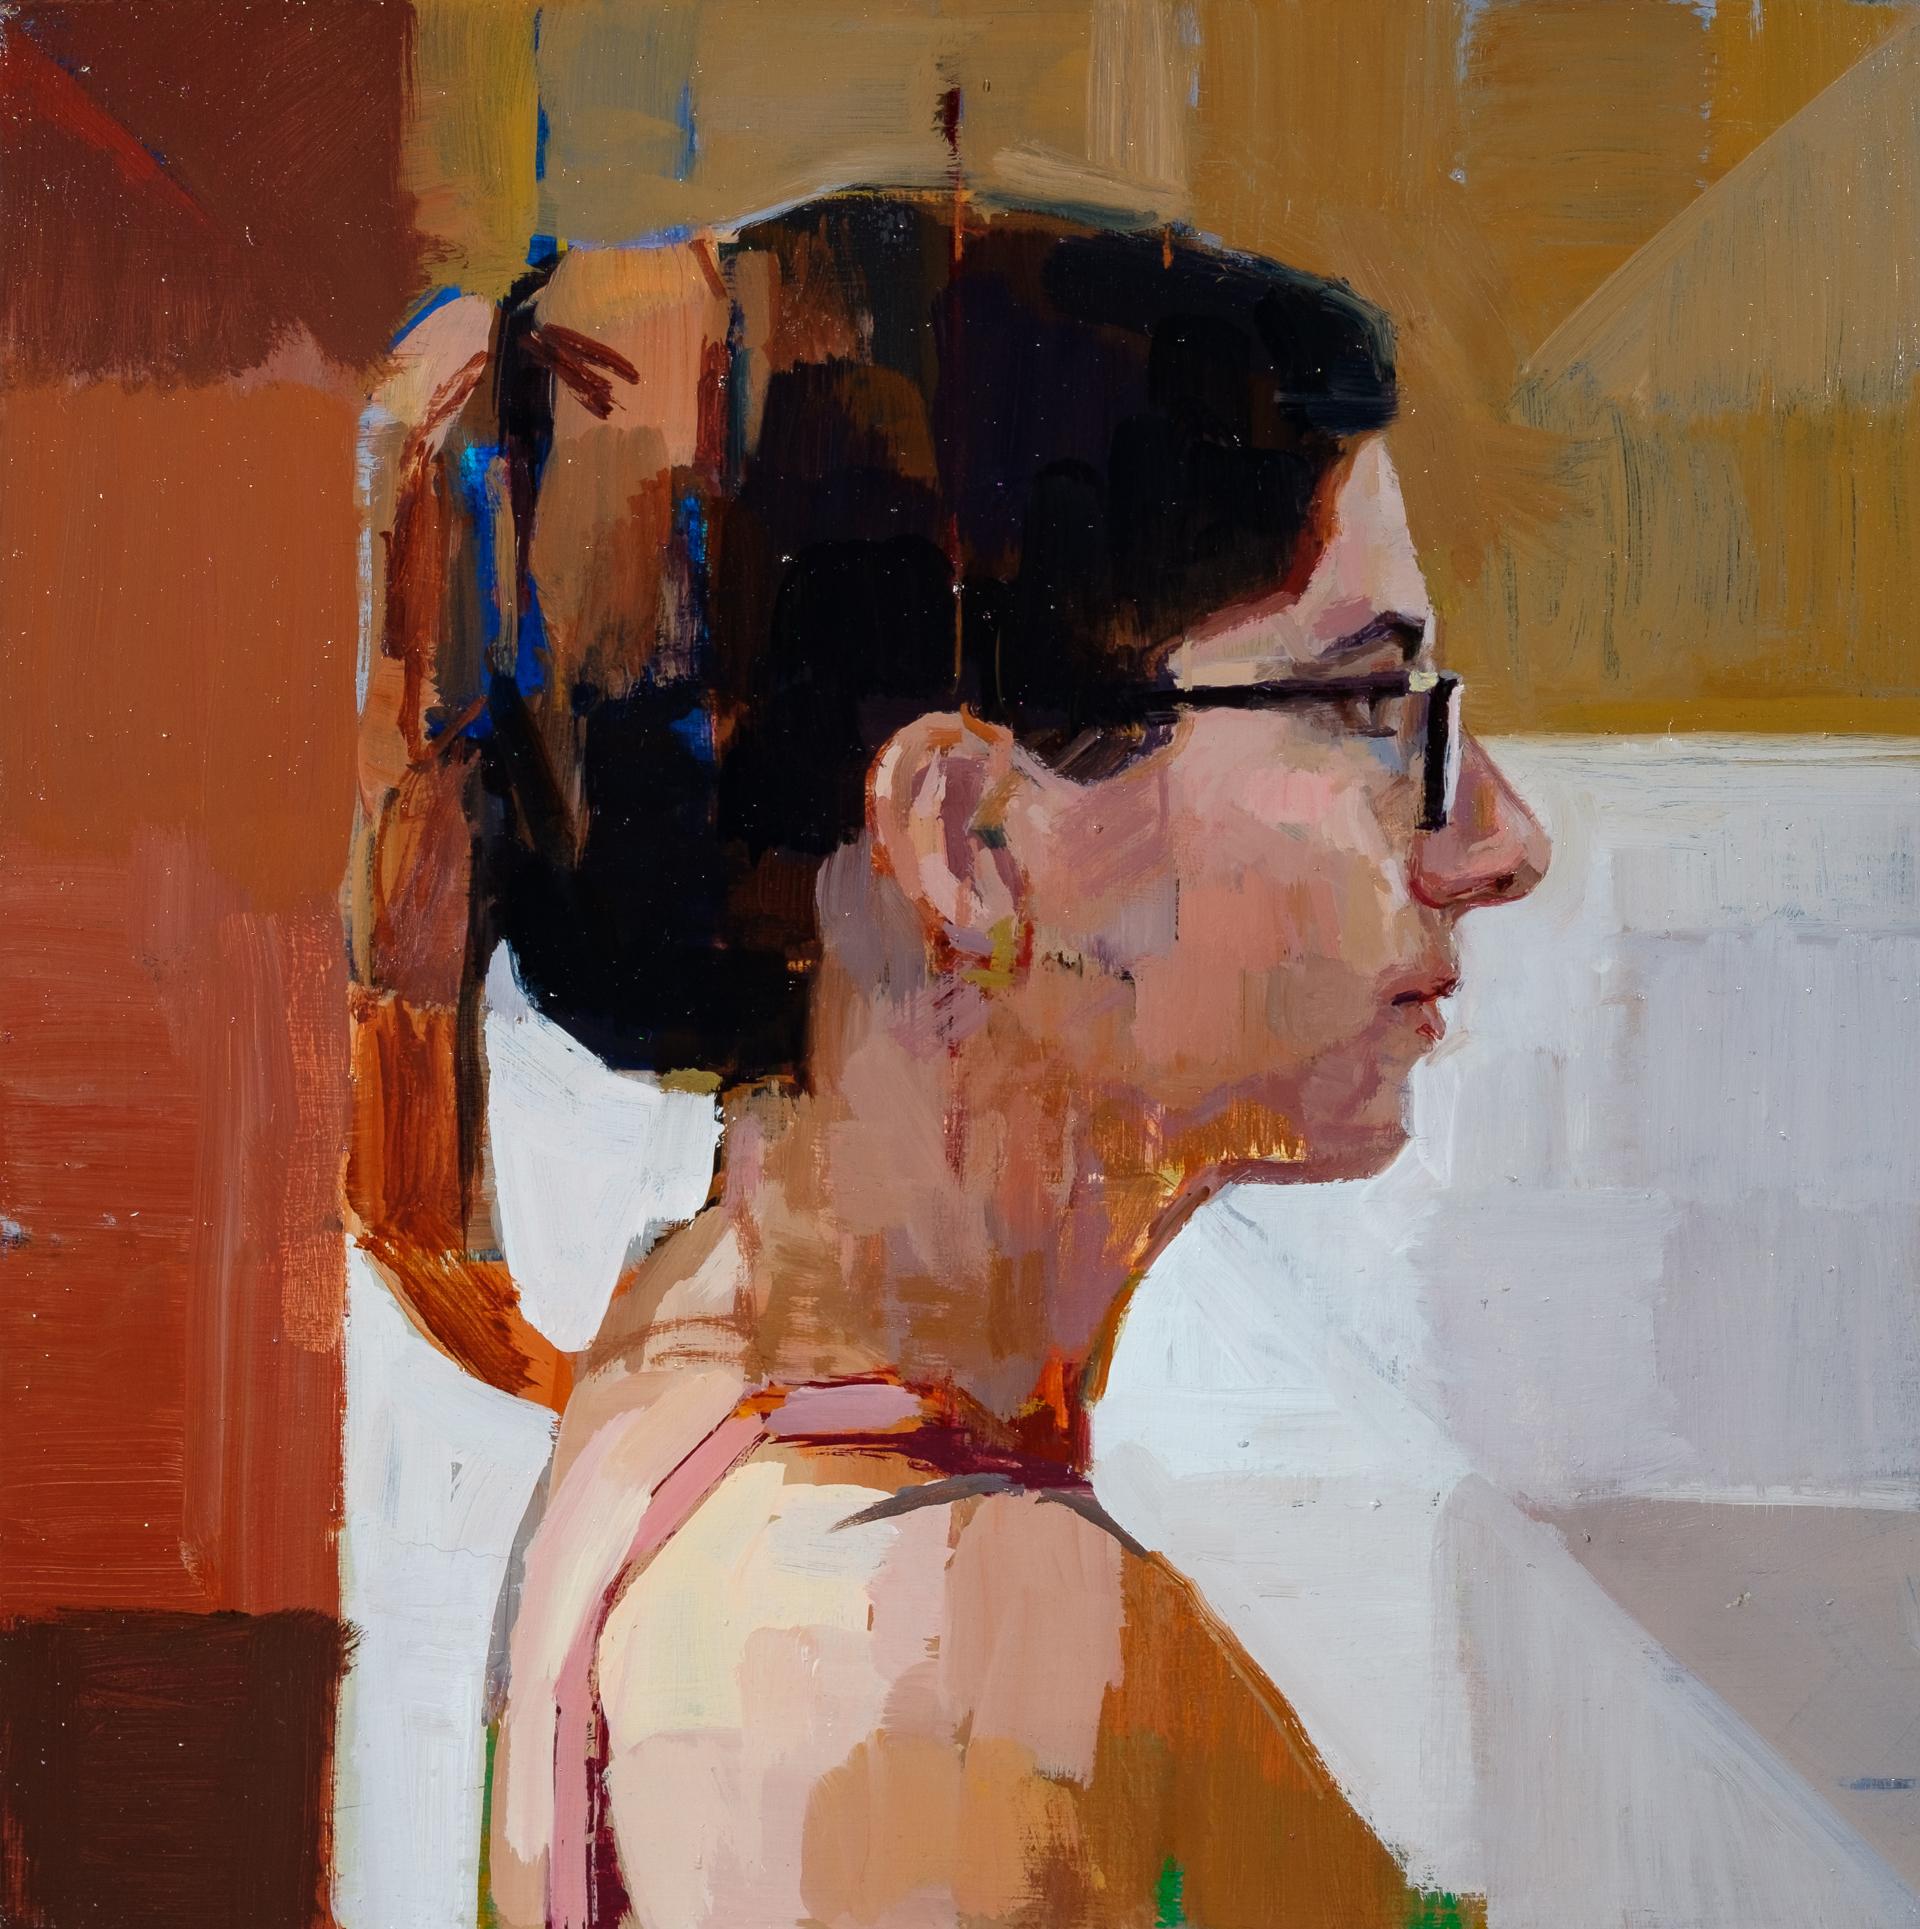 Side Profile 2 by Hiroshi Sato